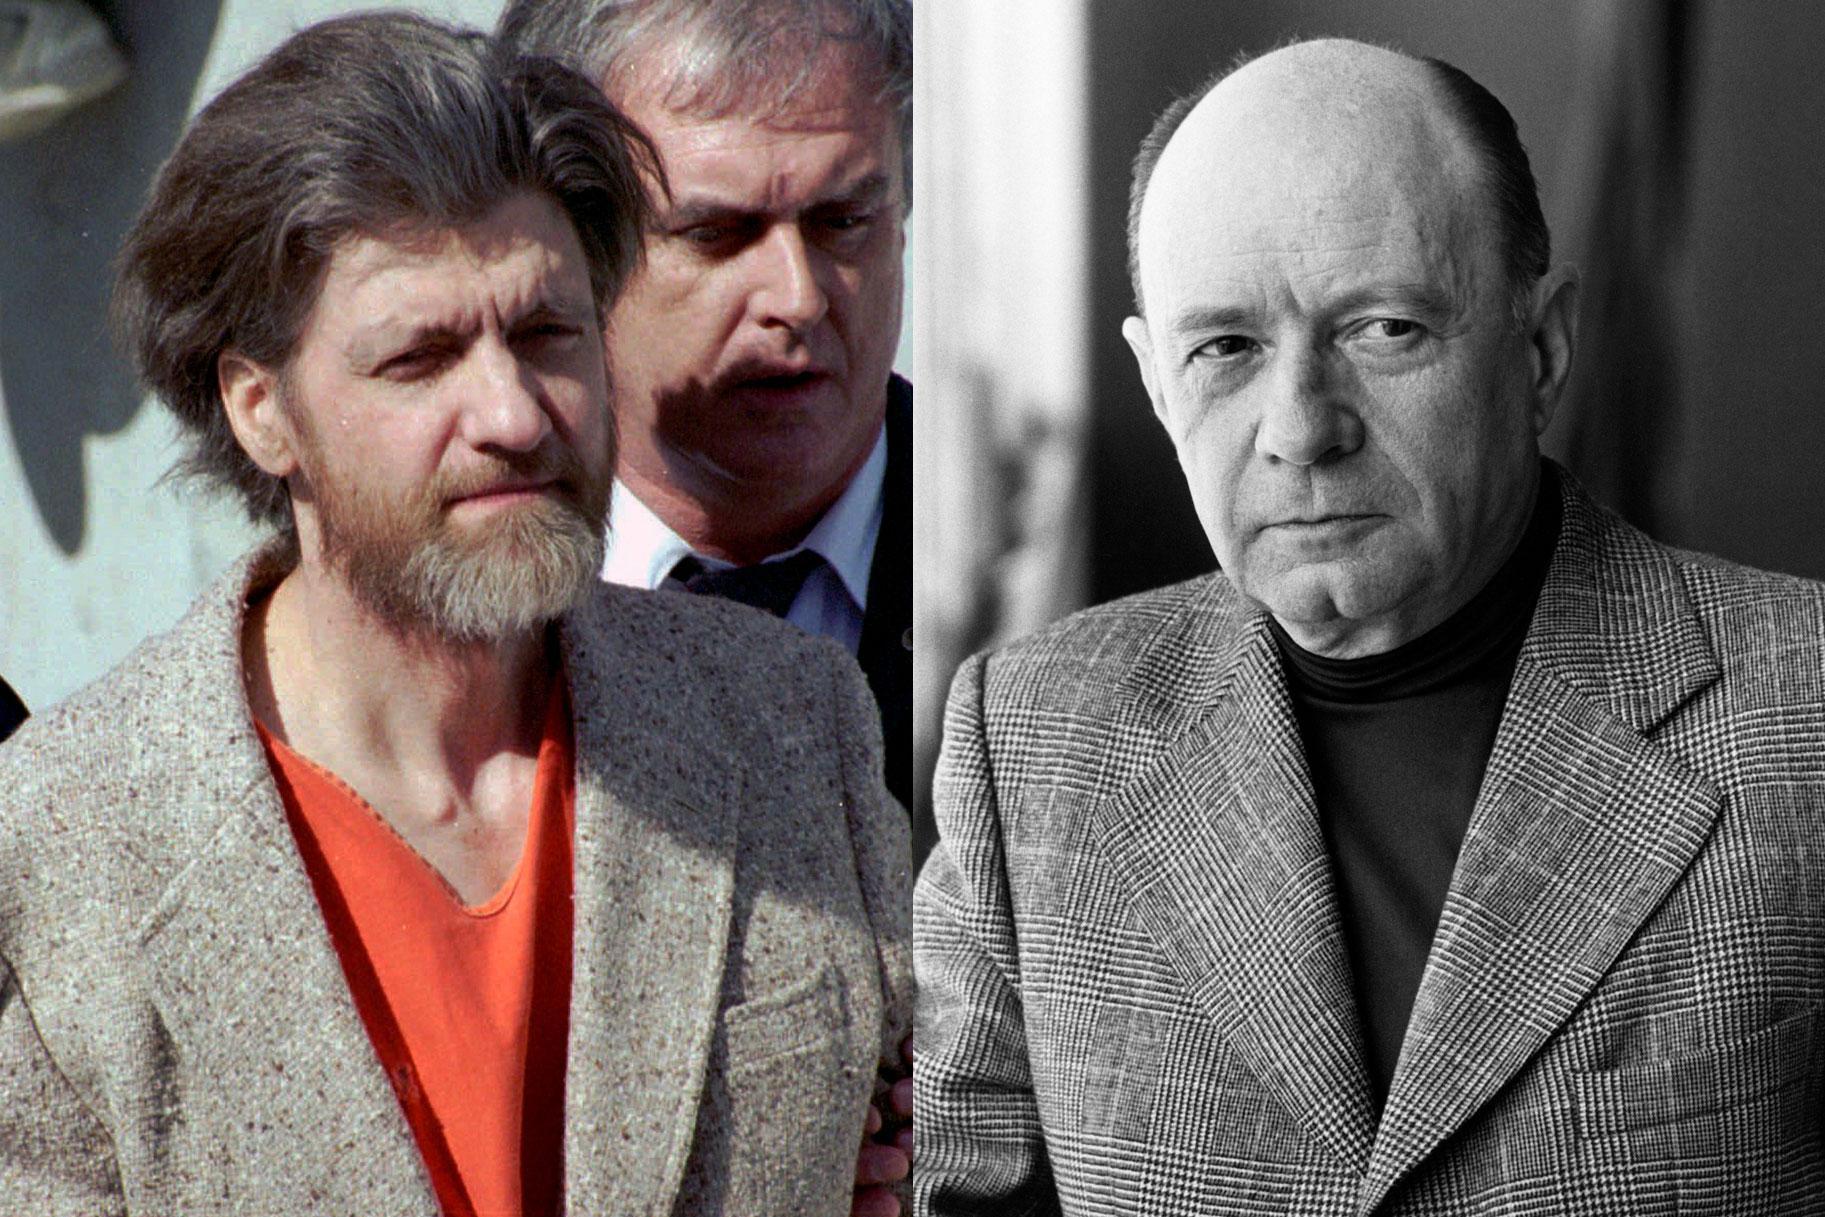 Siapa Falsafah Jacques Ellul Dan Bagaimana Penulisannya Mempengaruhi 'Unabomber' Ted Kaczynski?